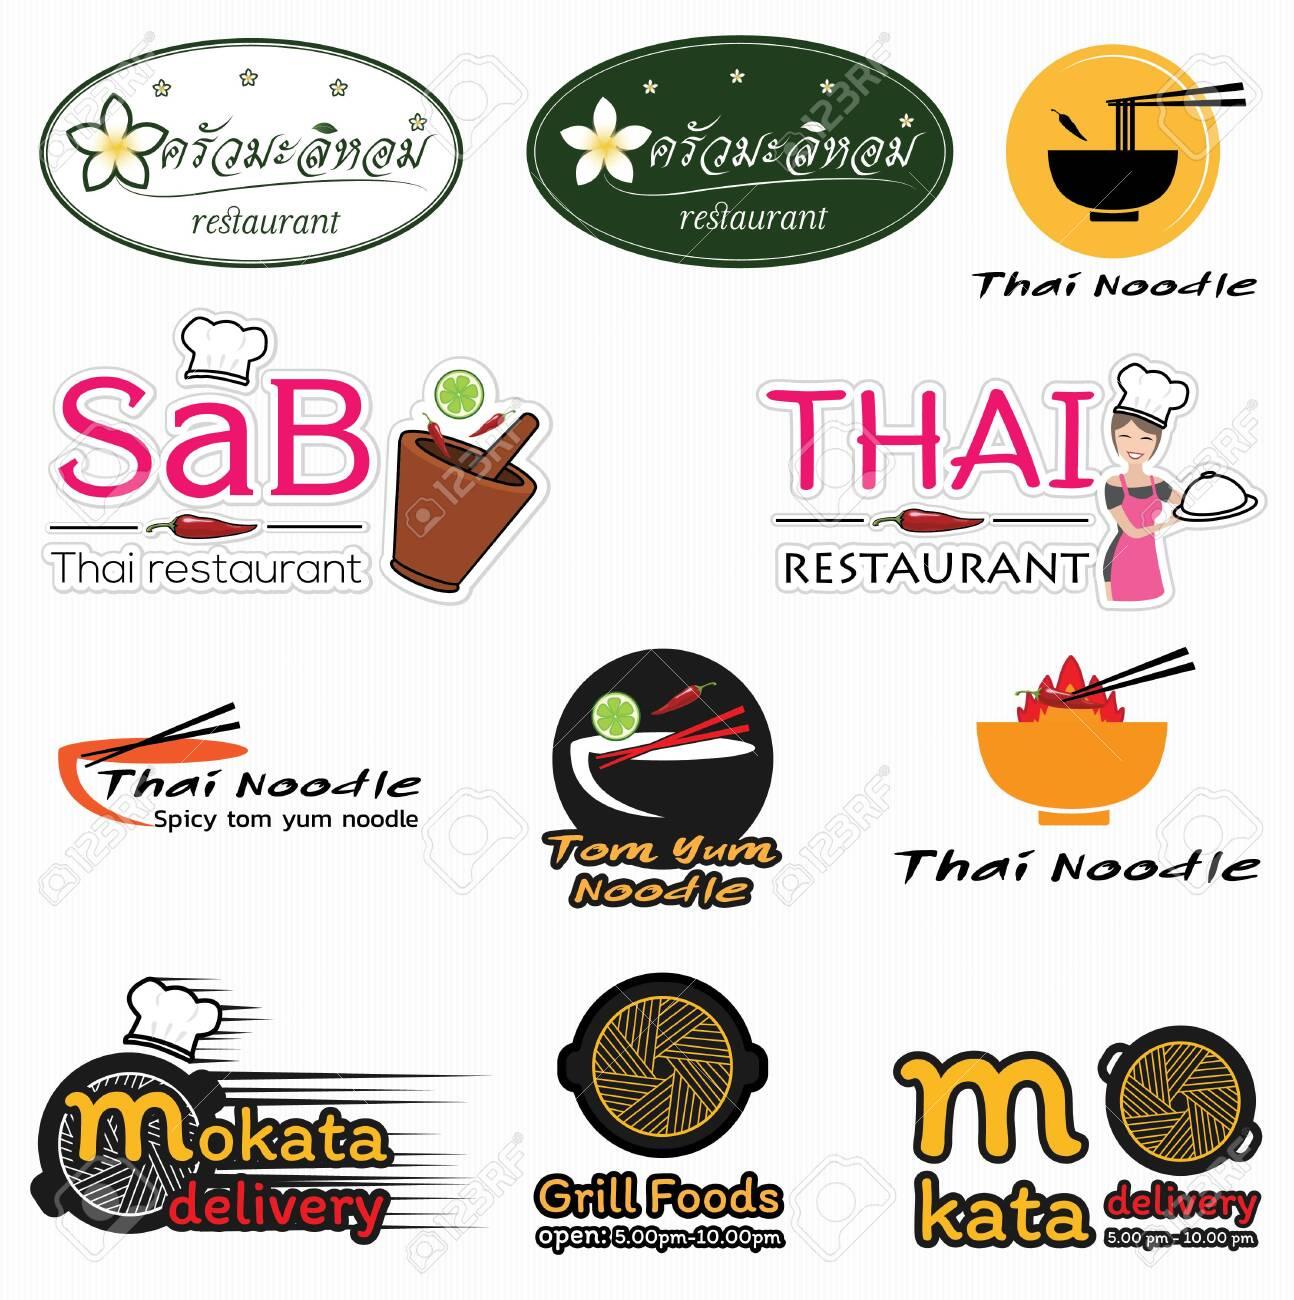 Logo Thai Restaurants Design Royalty Free Cliparts Vectors And Stock Illustration Image 127977557